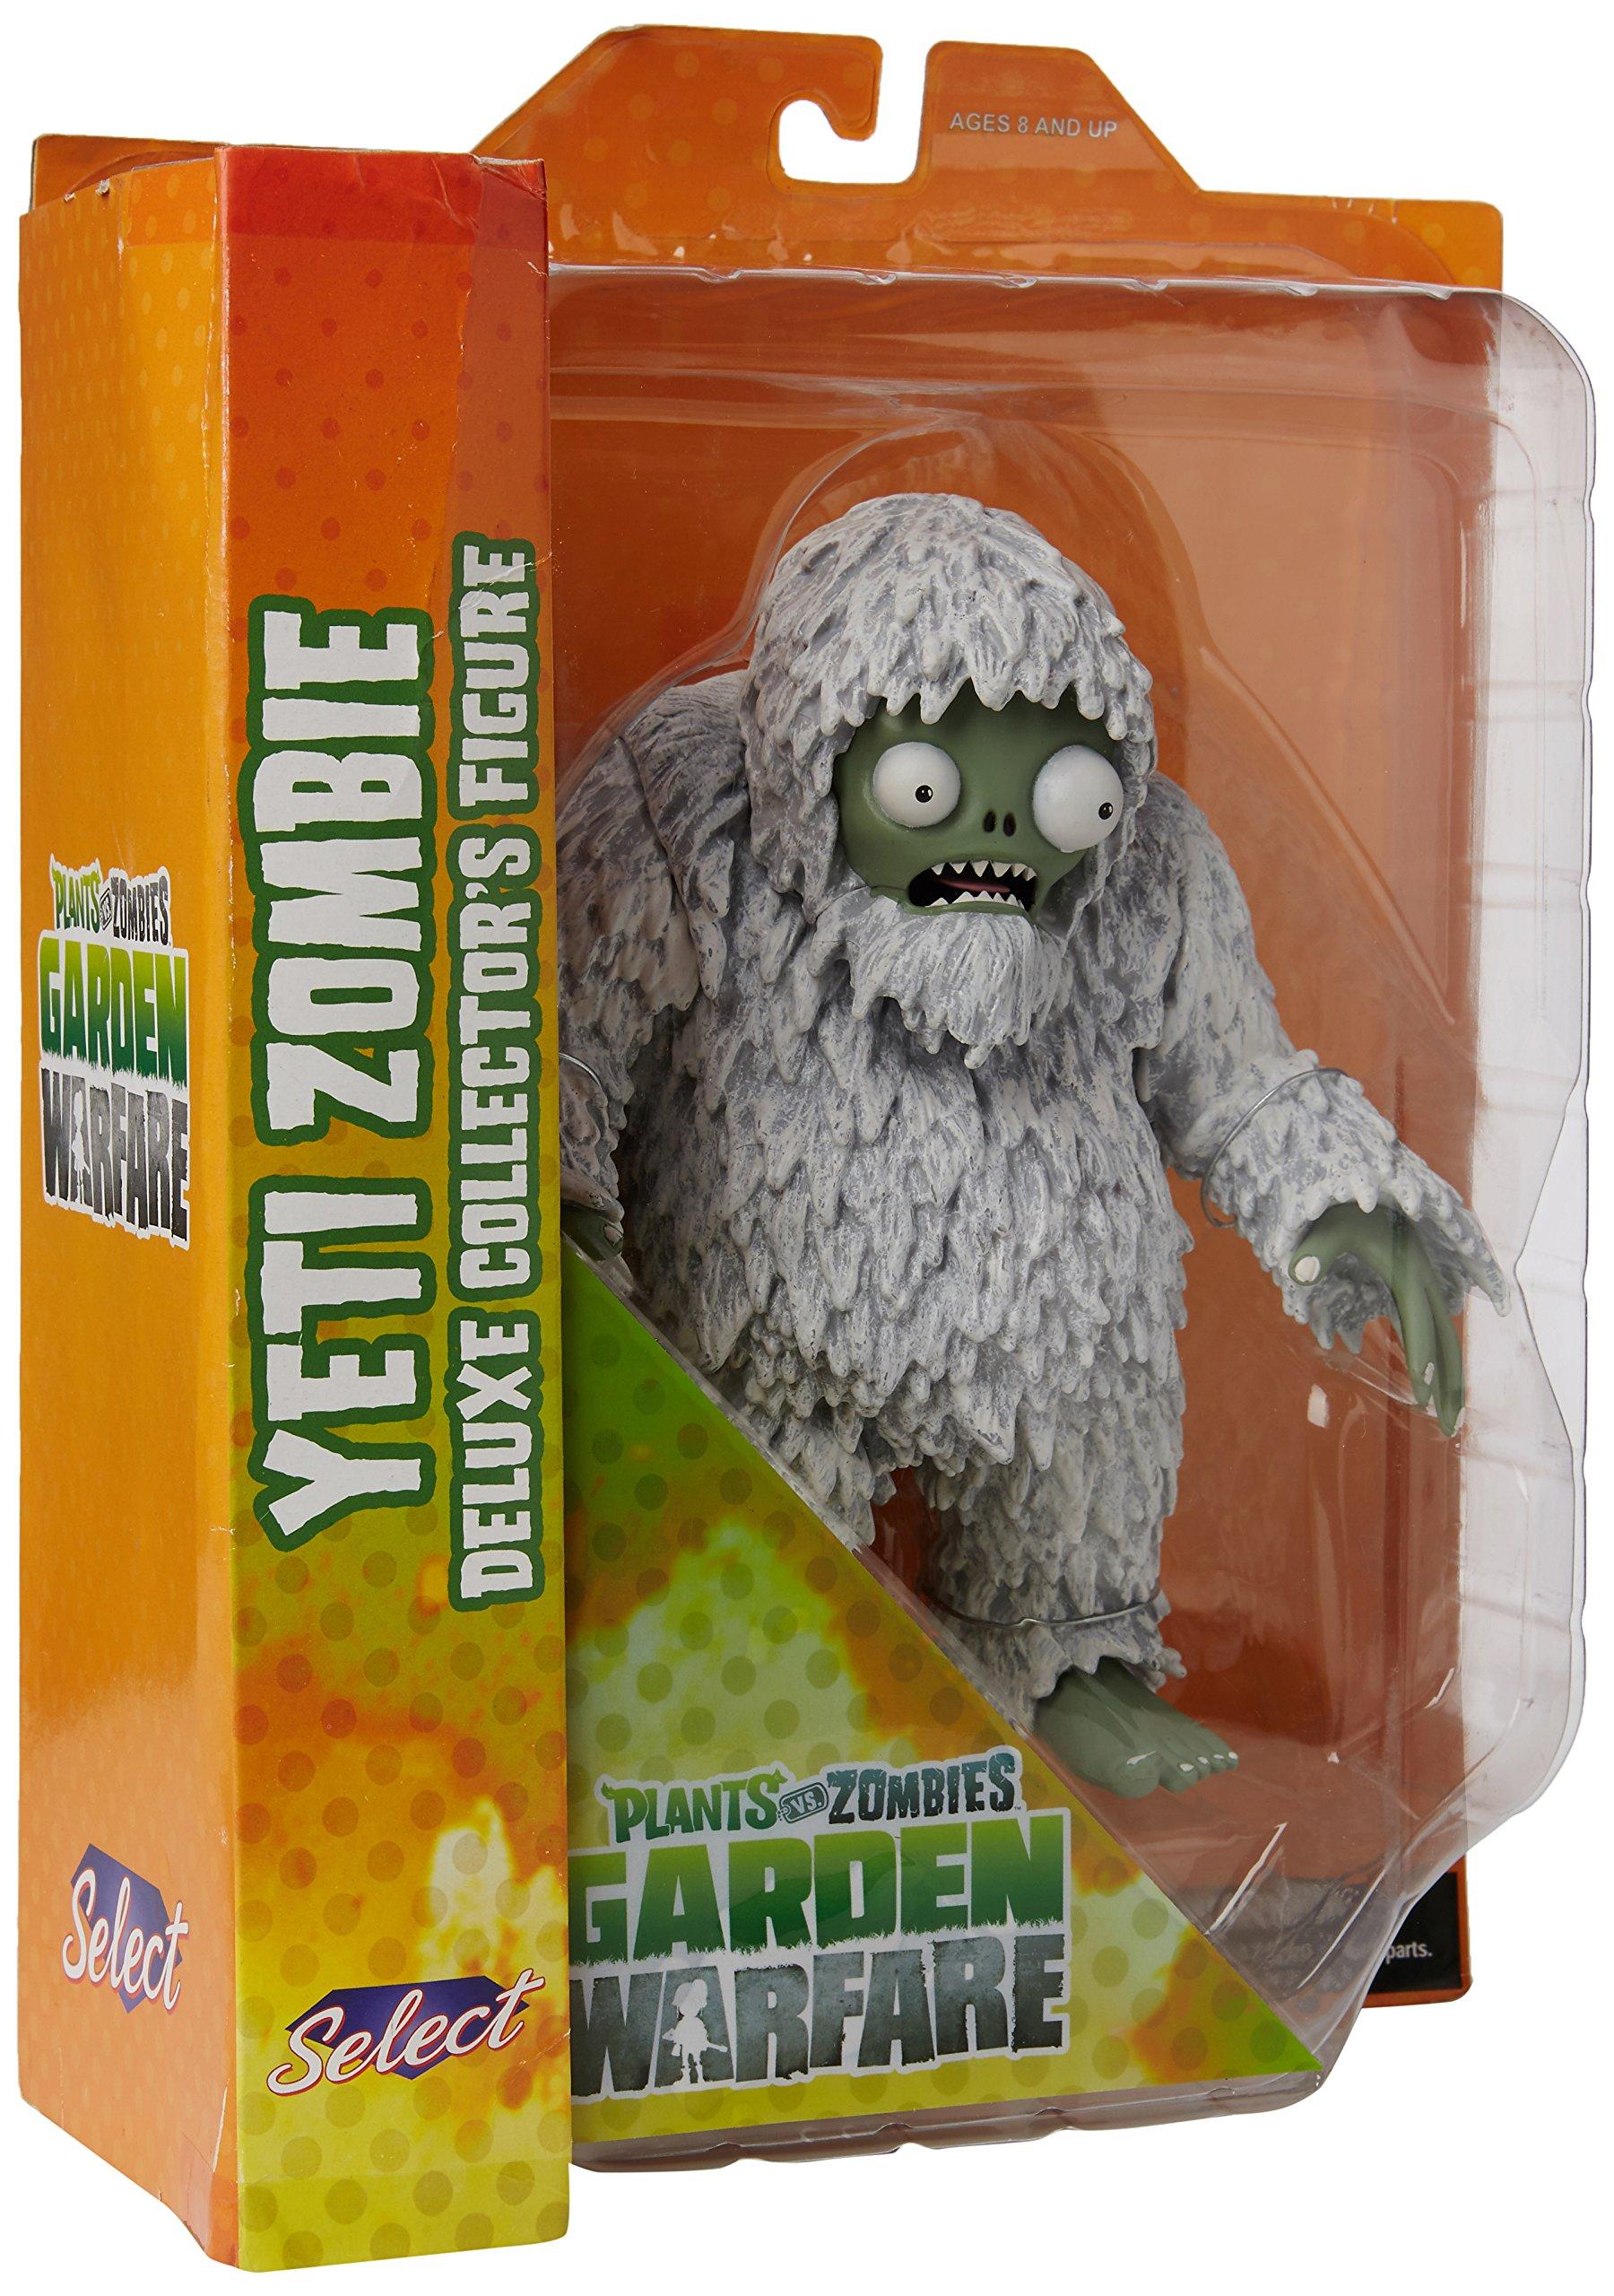 Plants Zombies Garden Warfare Deluxe